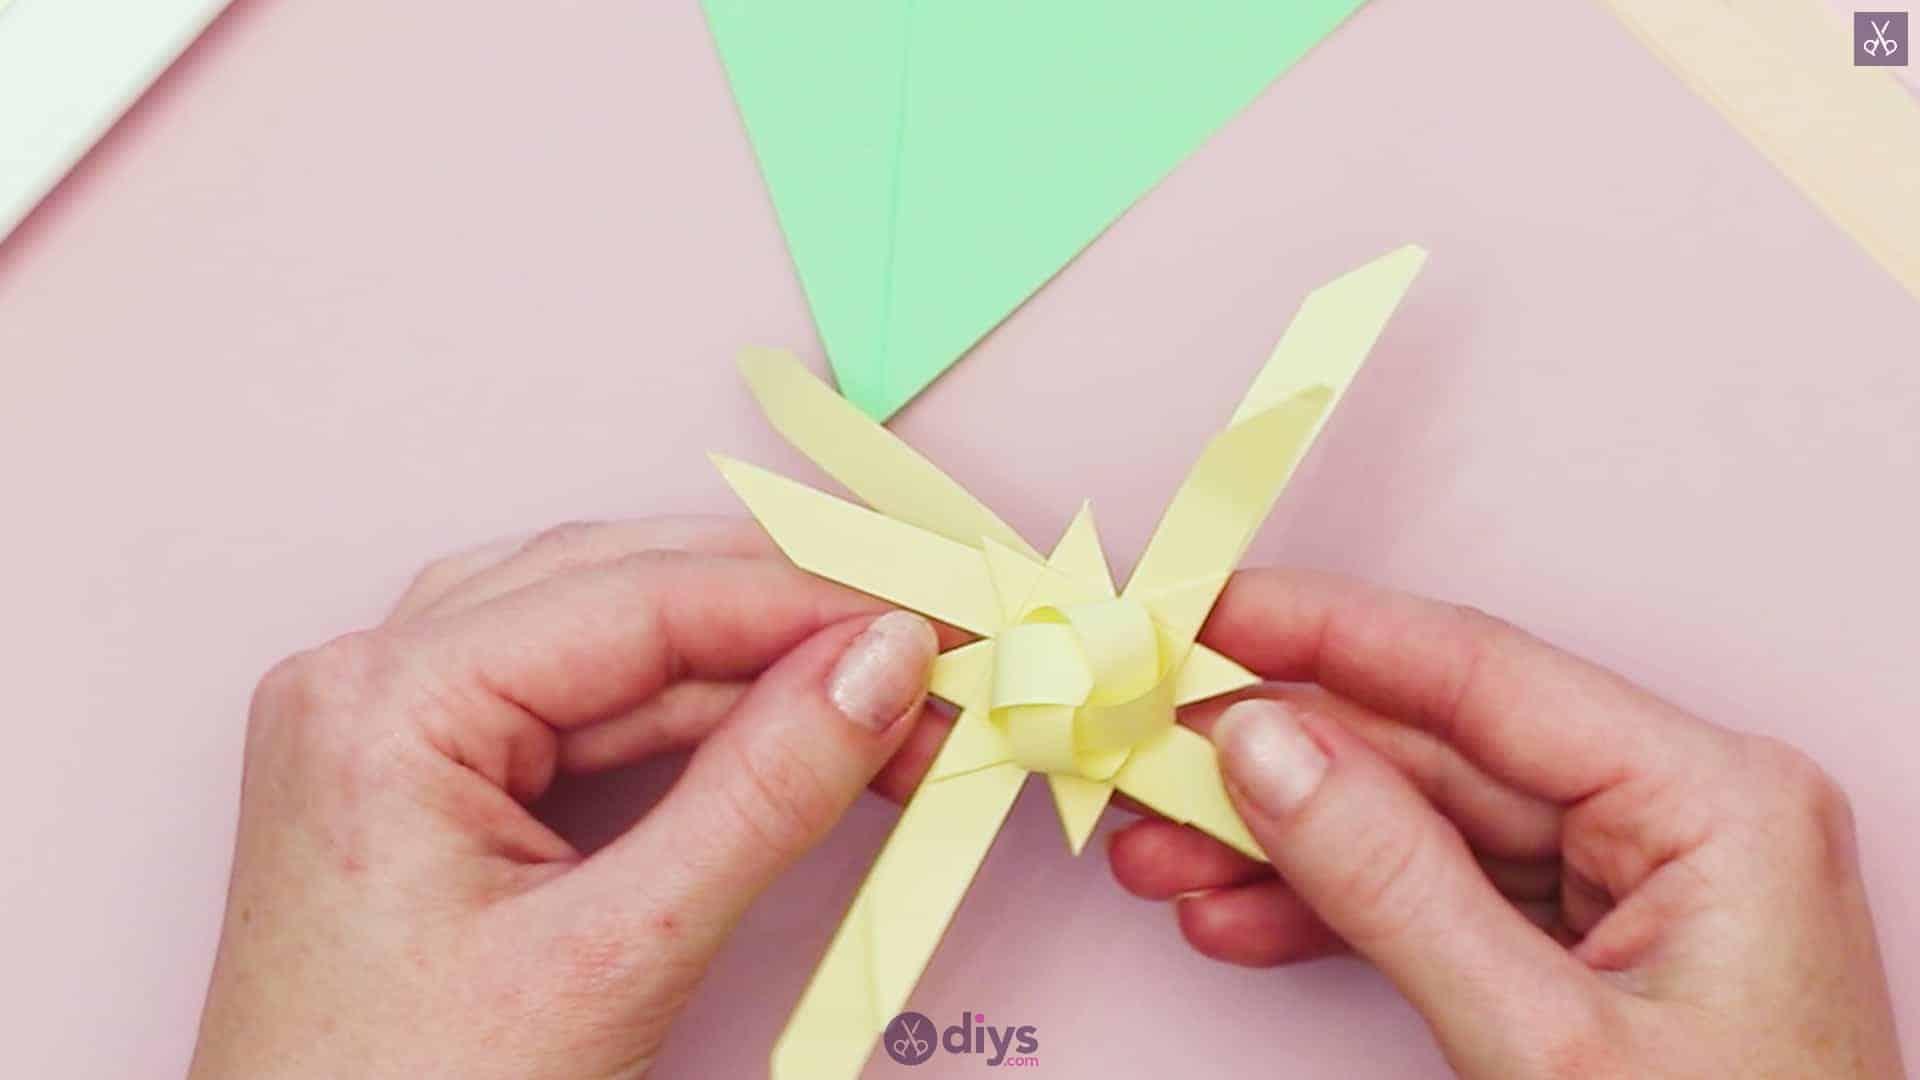 Diy origami flower art step 7d